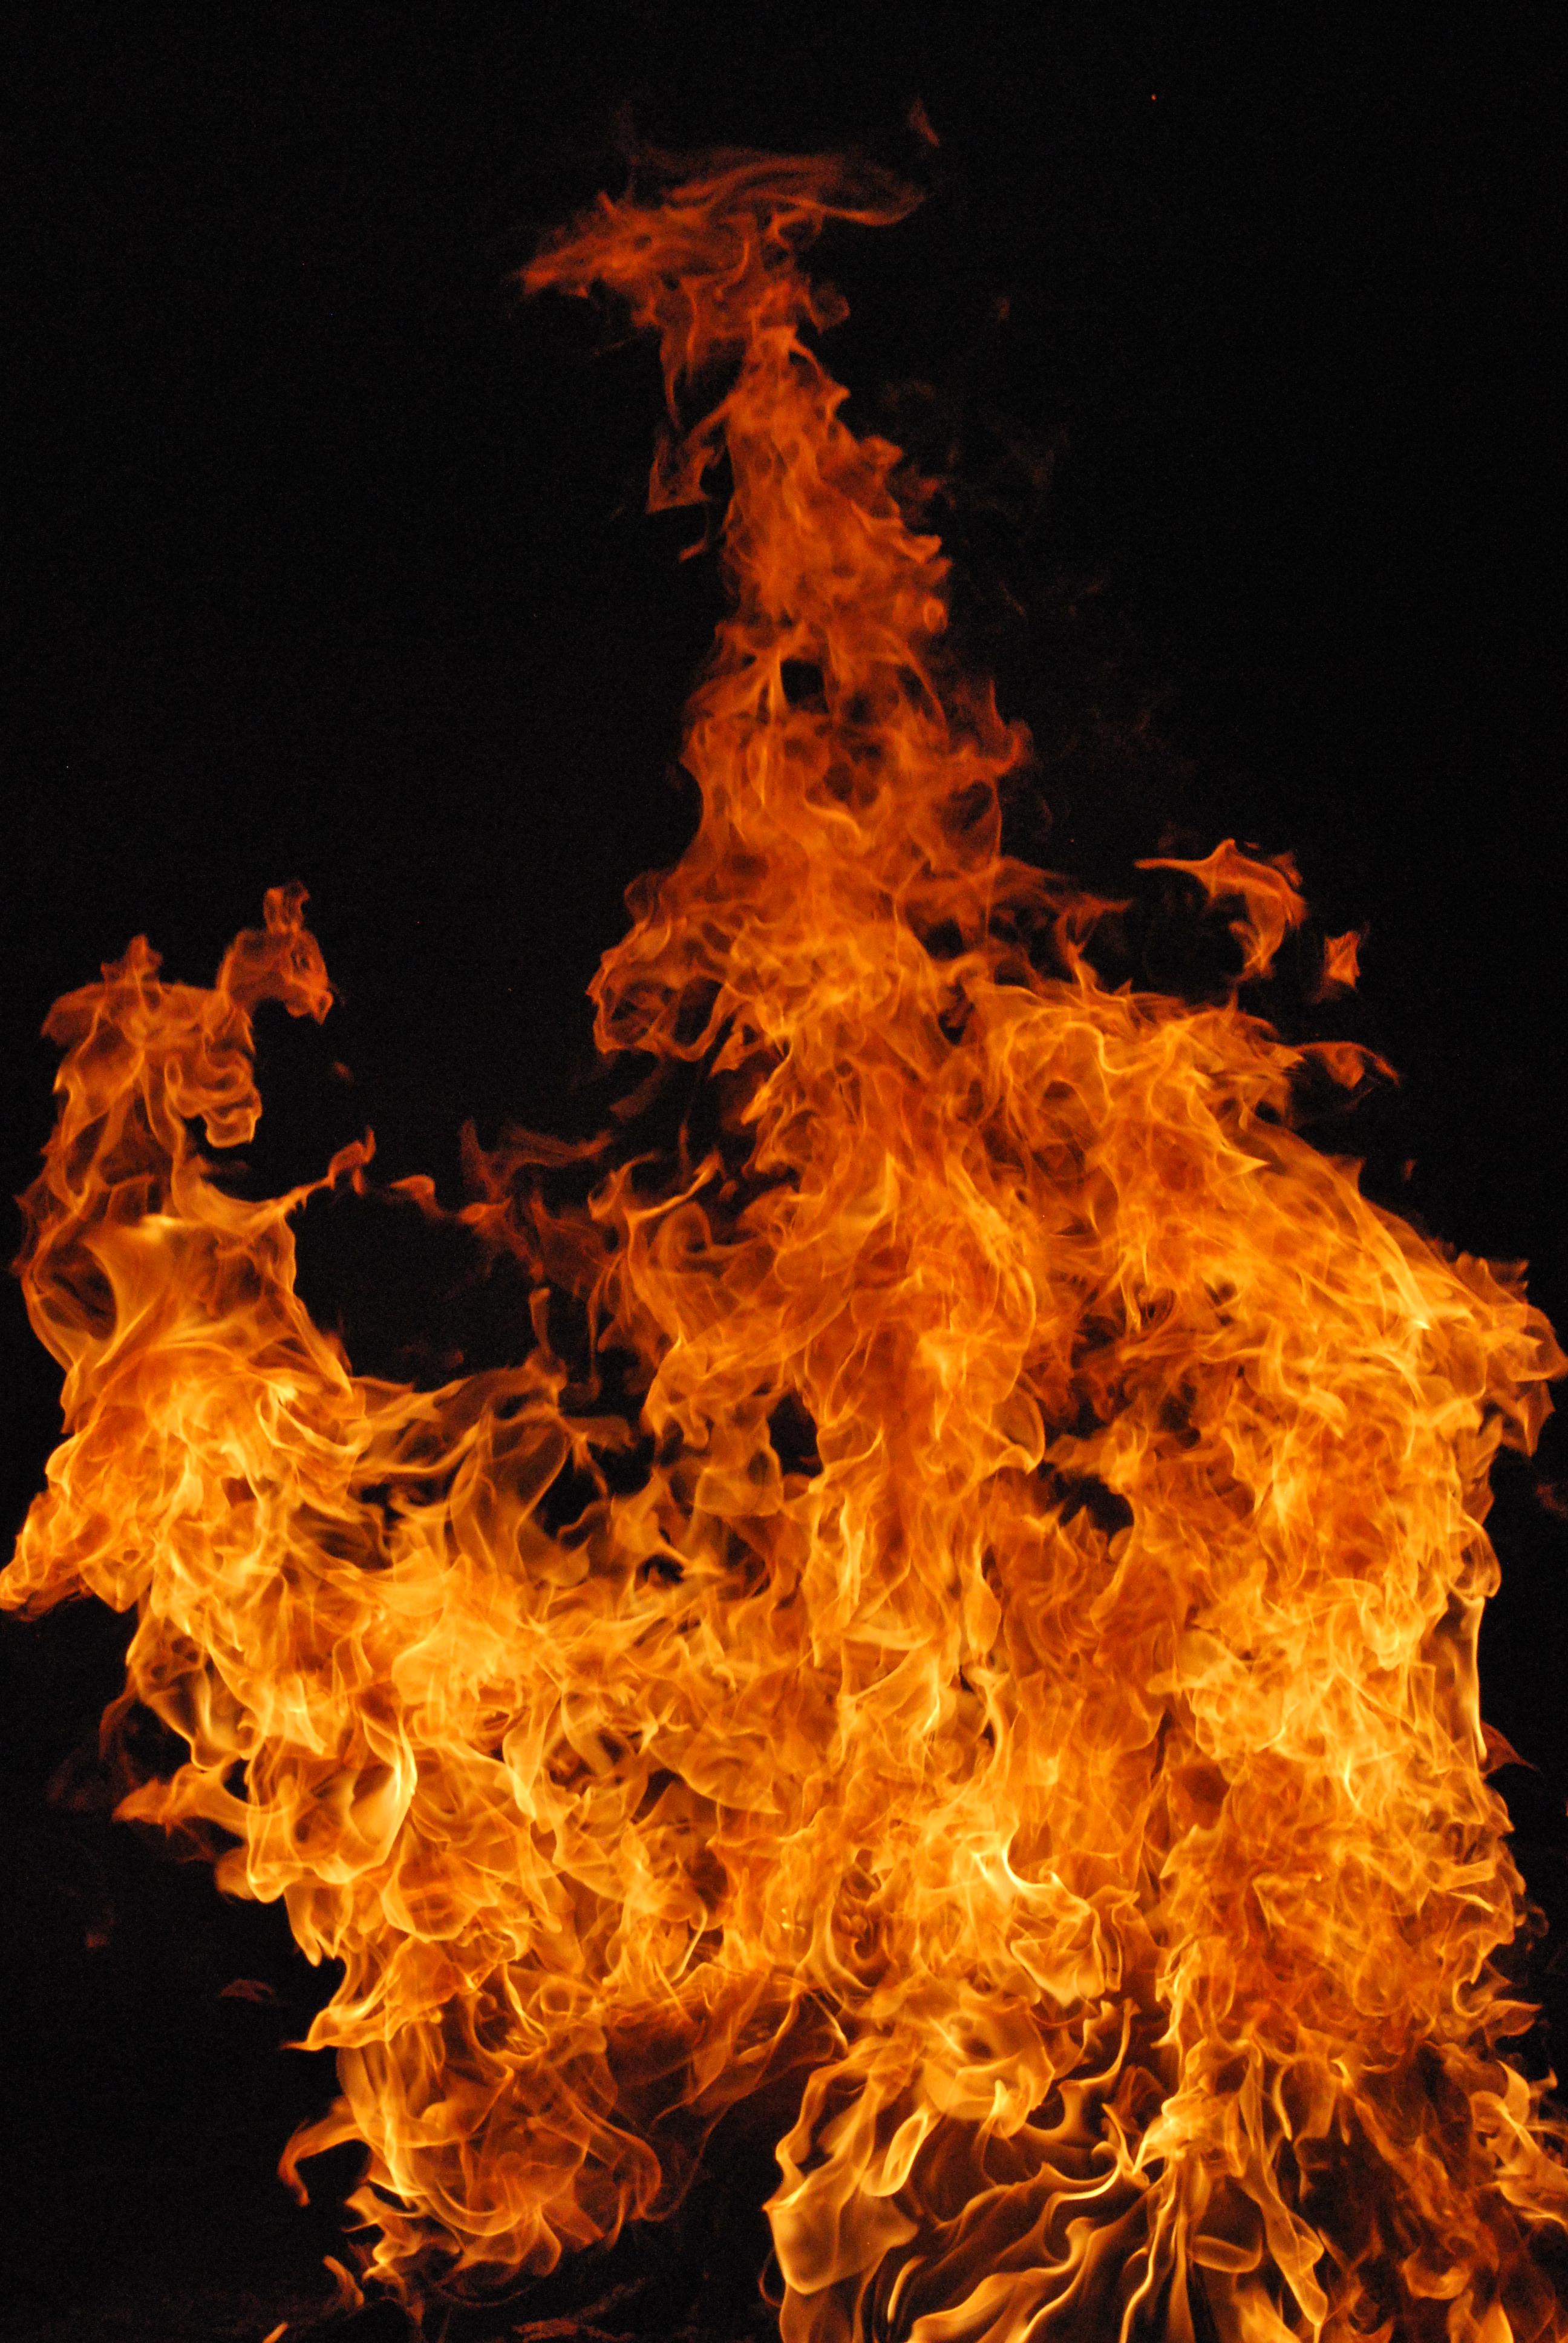 File:Texture Fire.jpg - Wikimedia Commons